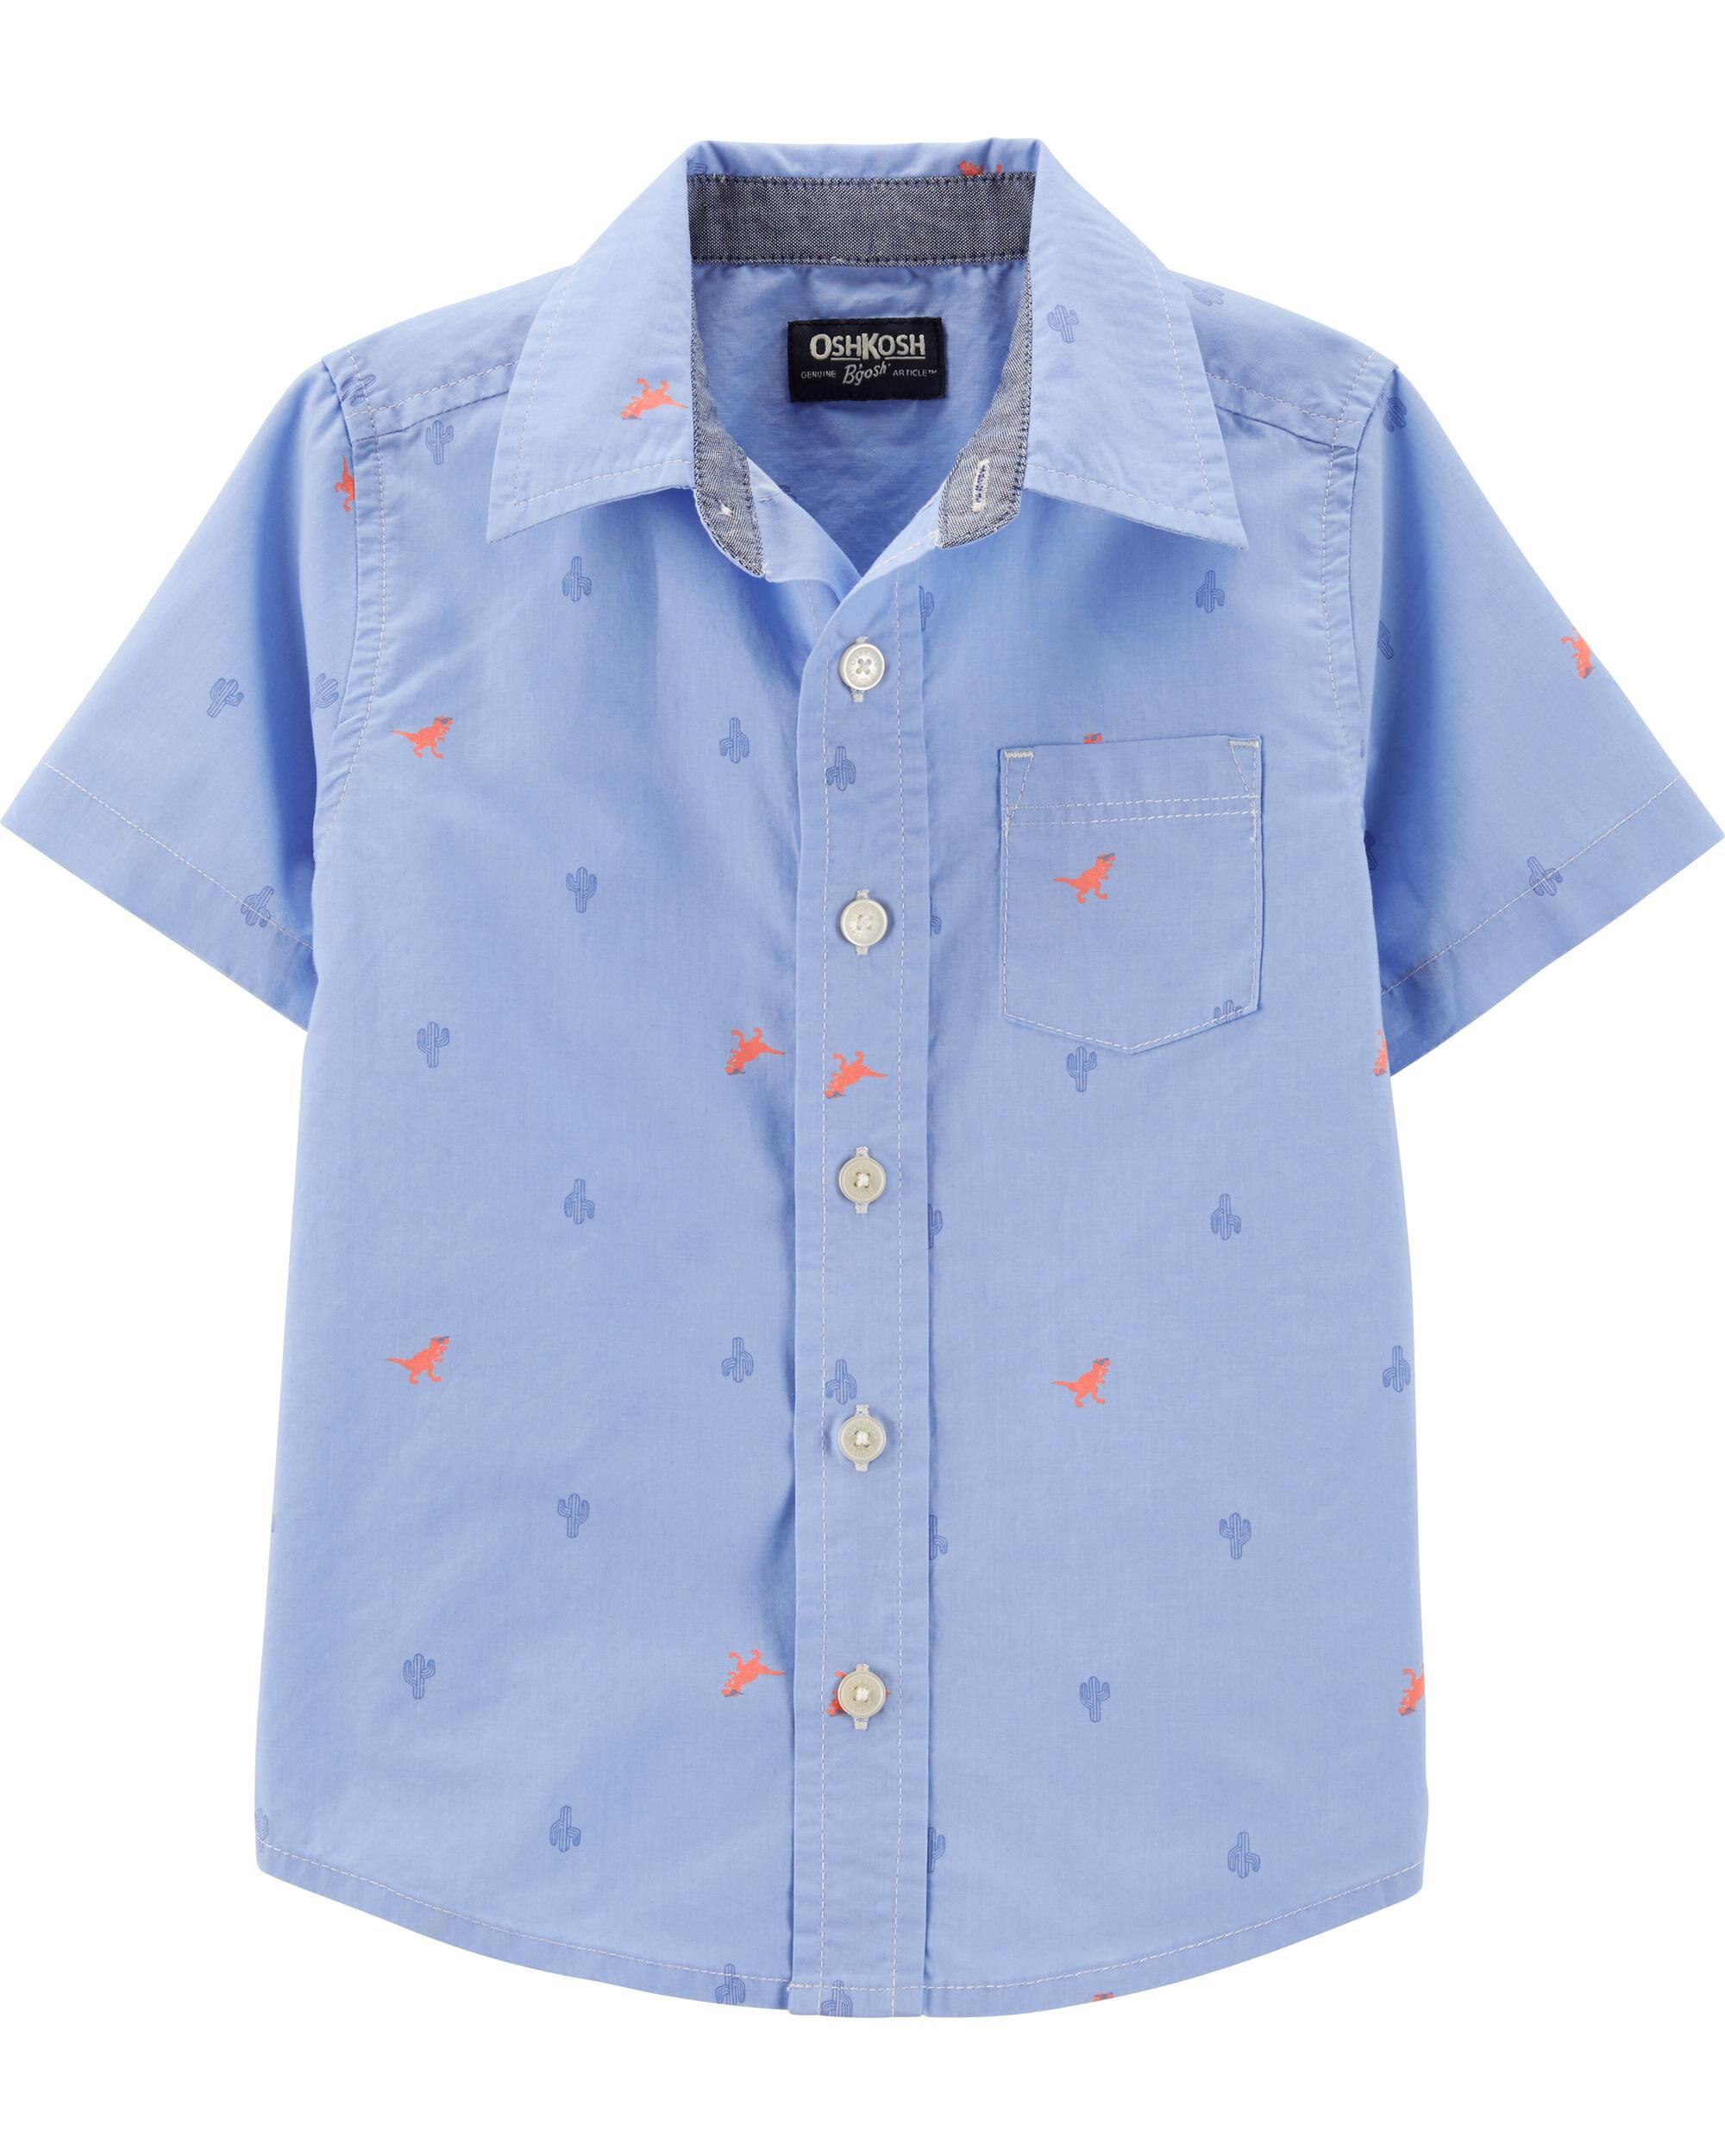 059254531 Button-Front Dinosaur Shirt | OshKosh.com